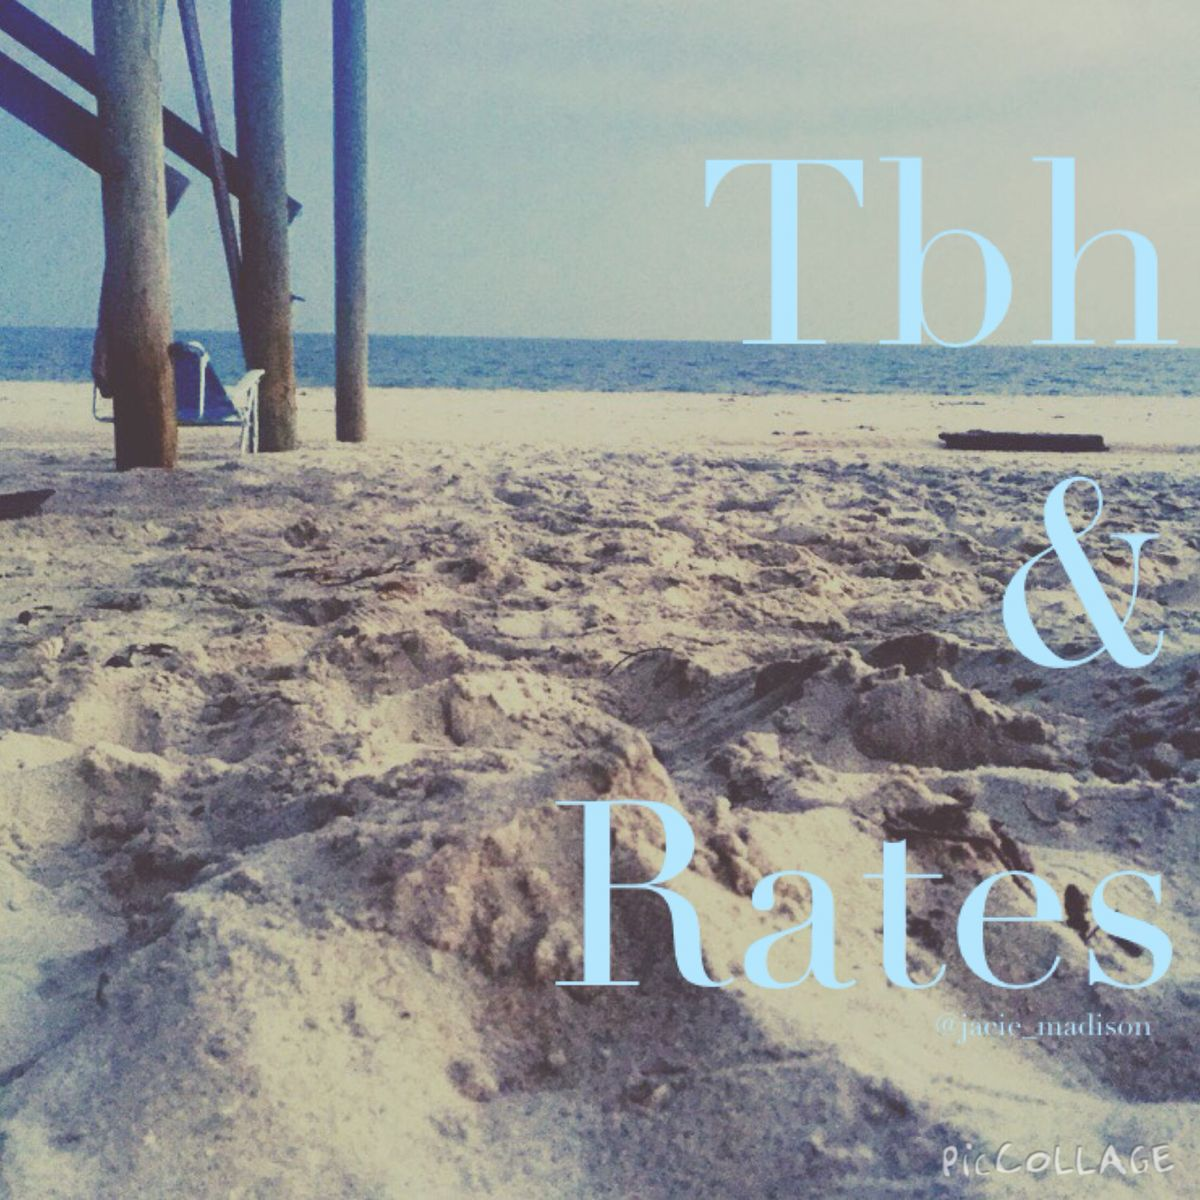 Tara The Dating Divas (@datingdivas) Instagram photos and videos